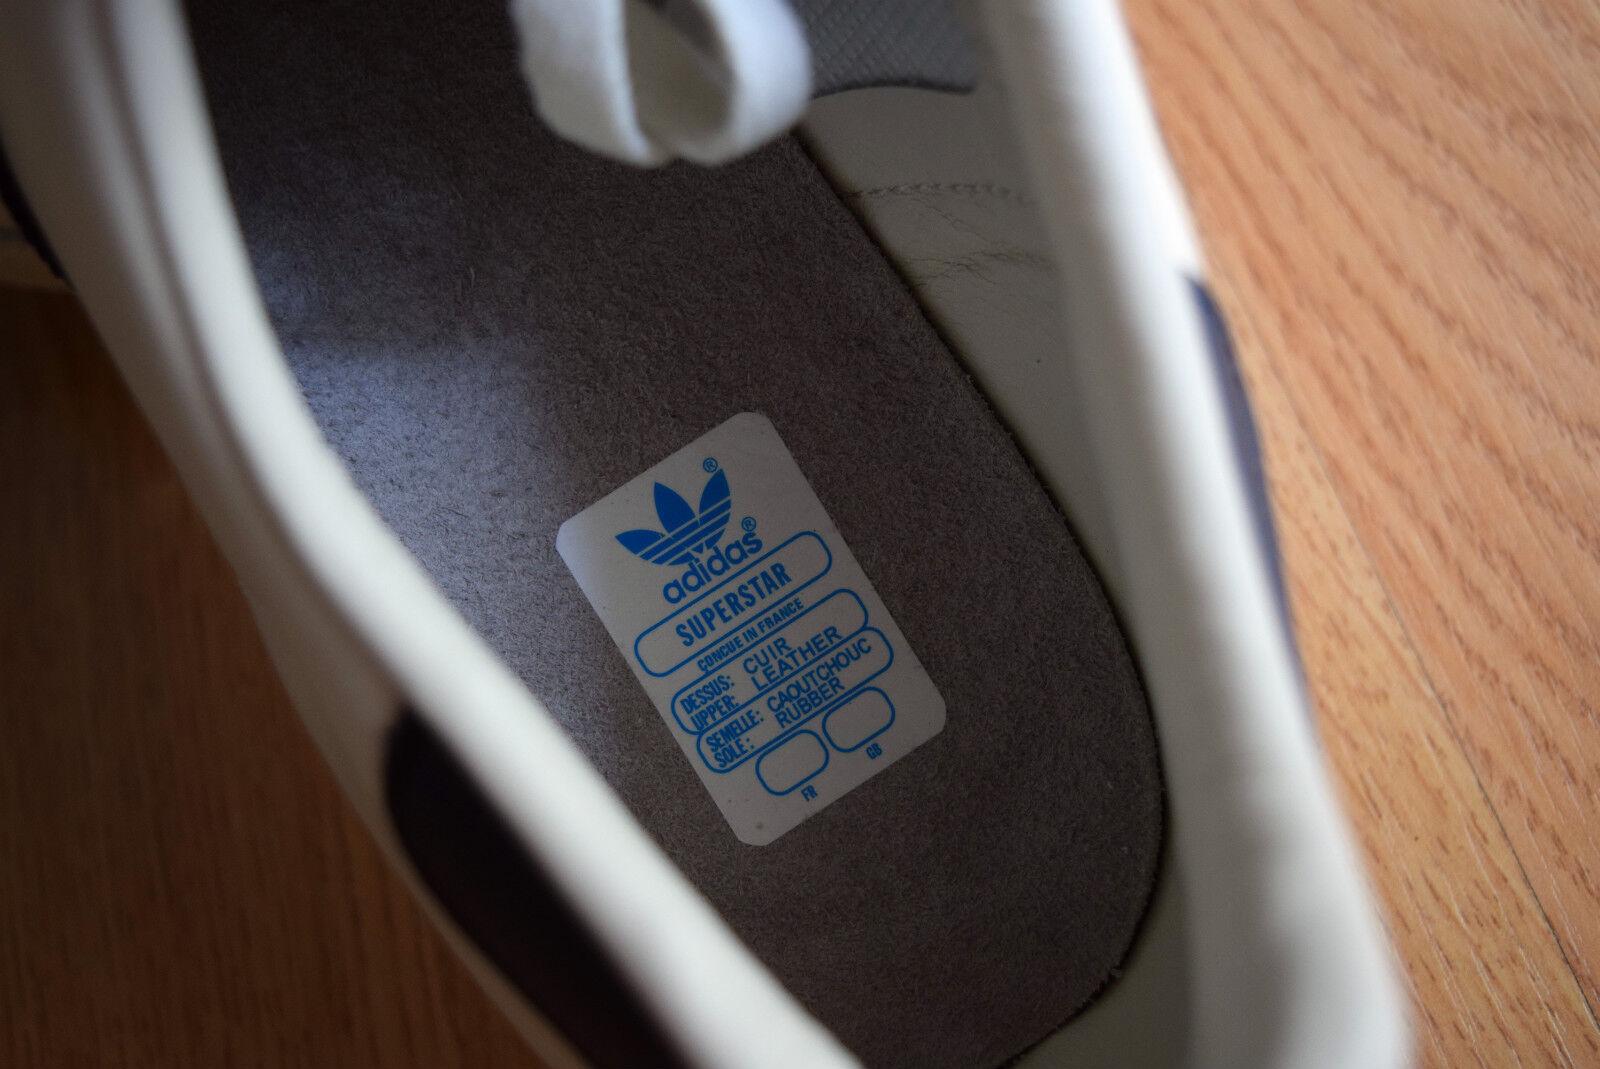 adidas Superstar 80s DLX 47 49 B25964 rom cAmPuS 80's sTan smitH forUm dEcadE 80's cAmPuS 5a4142